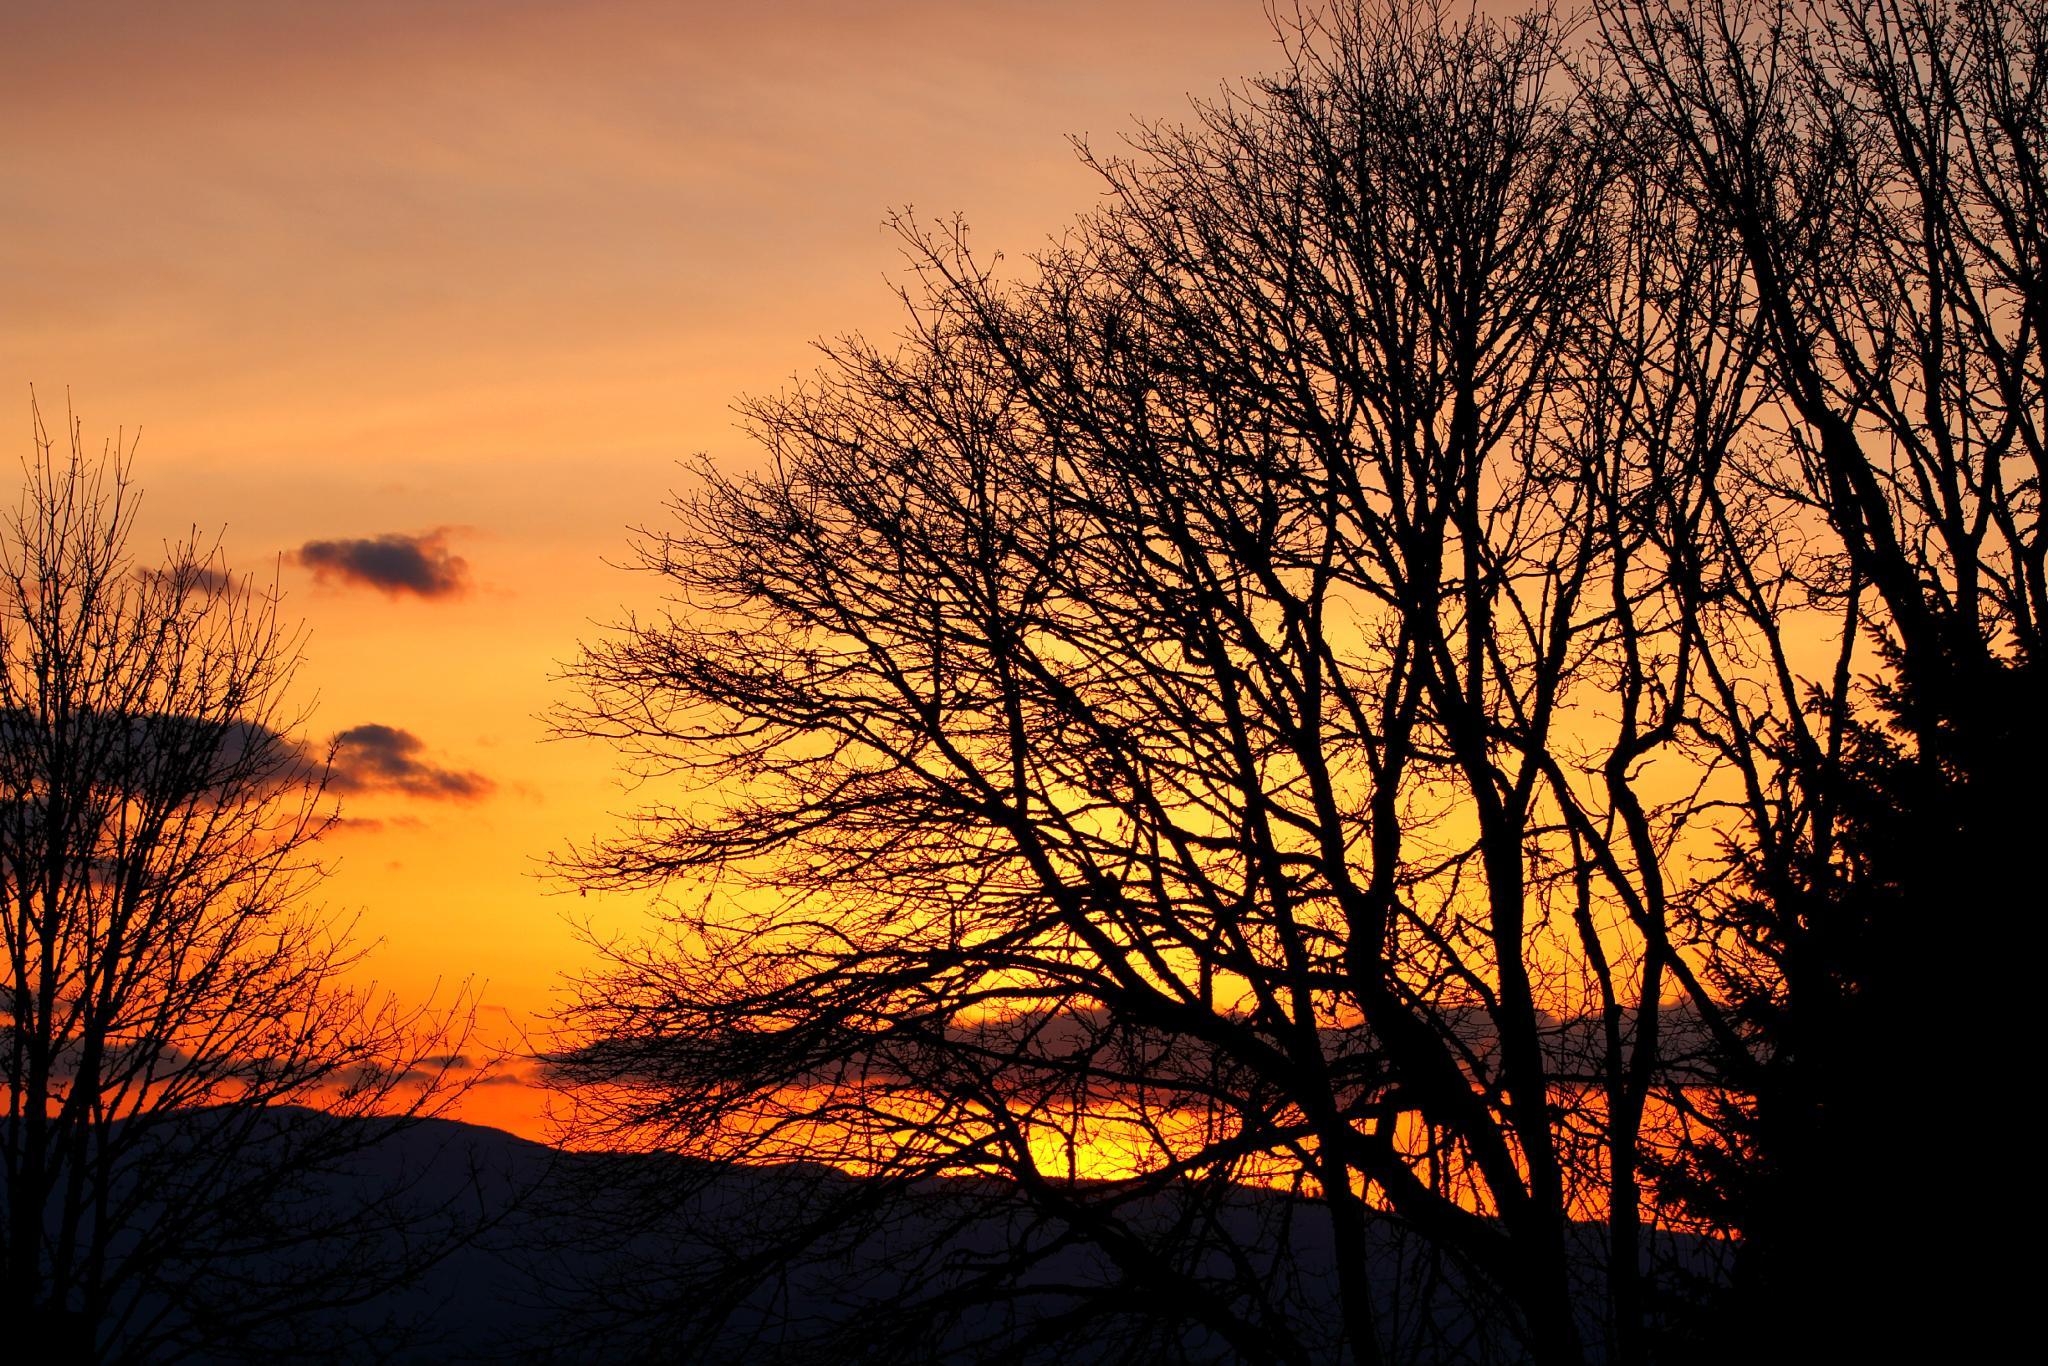 Oregon sunset by dennis.glisson